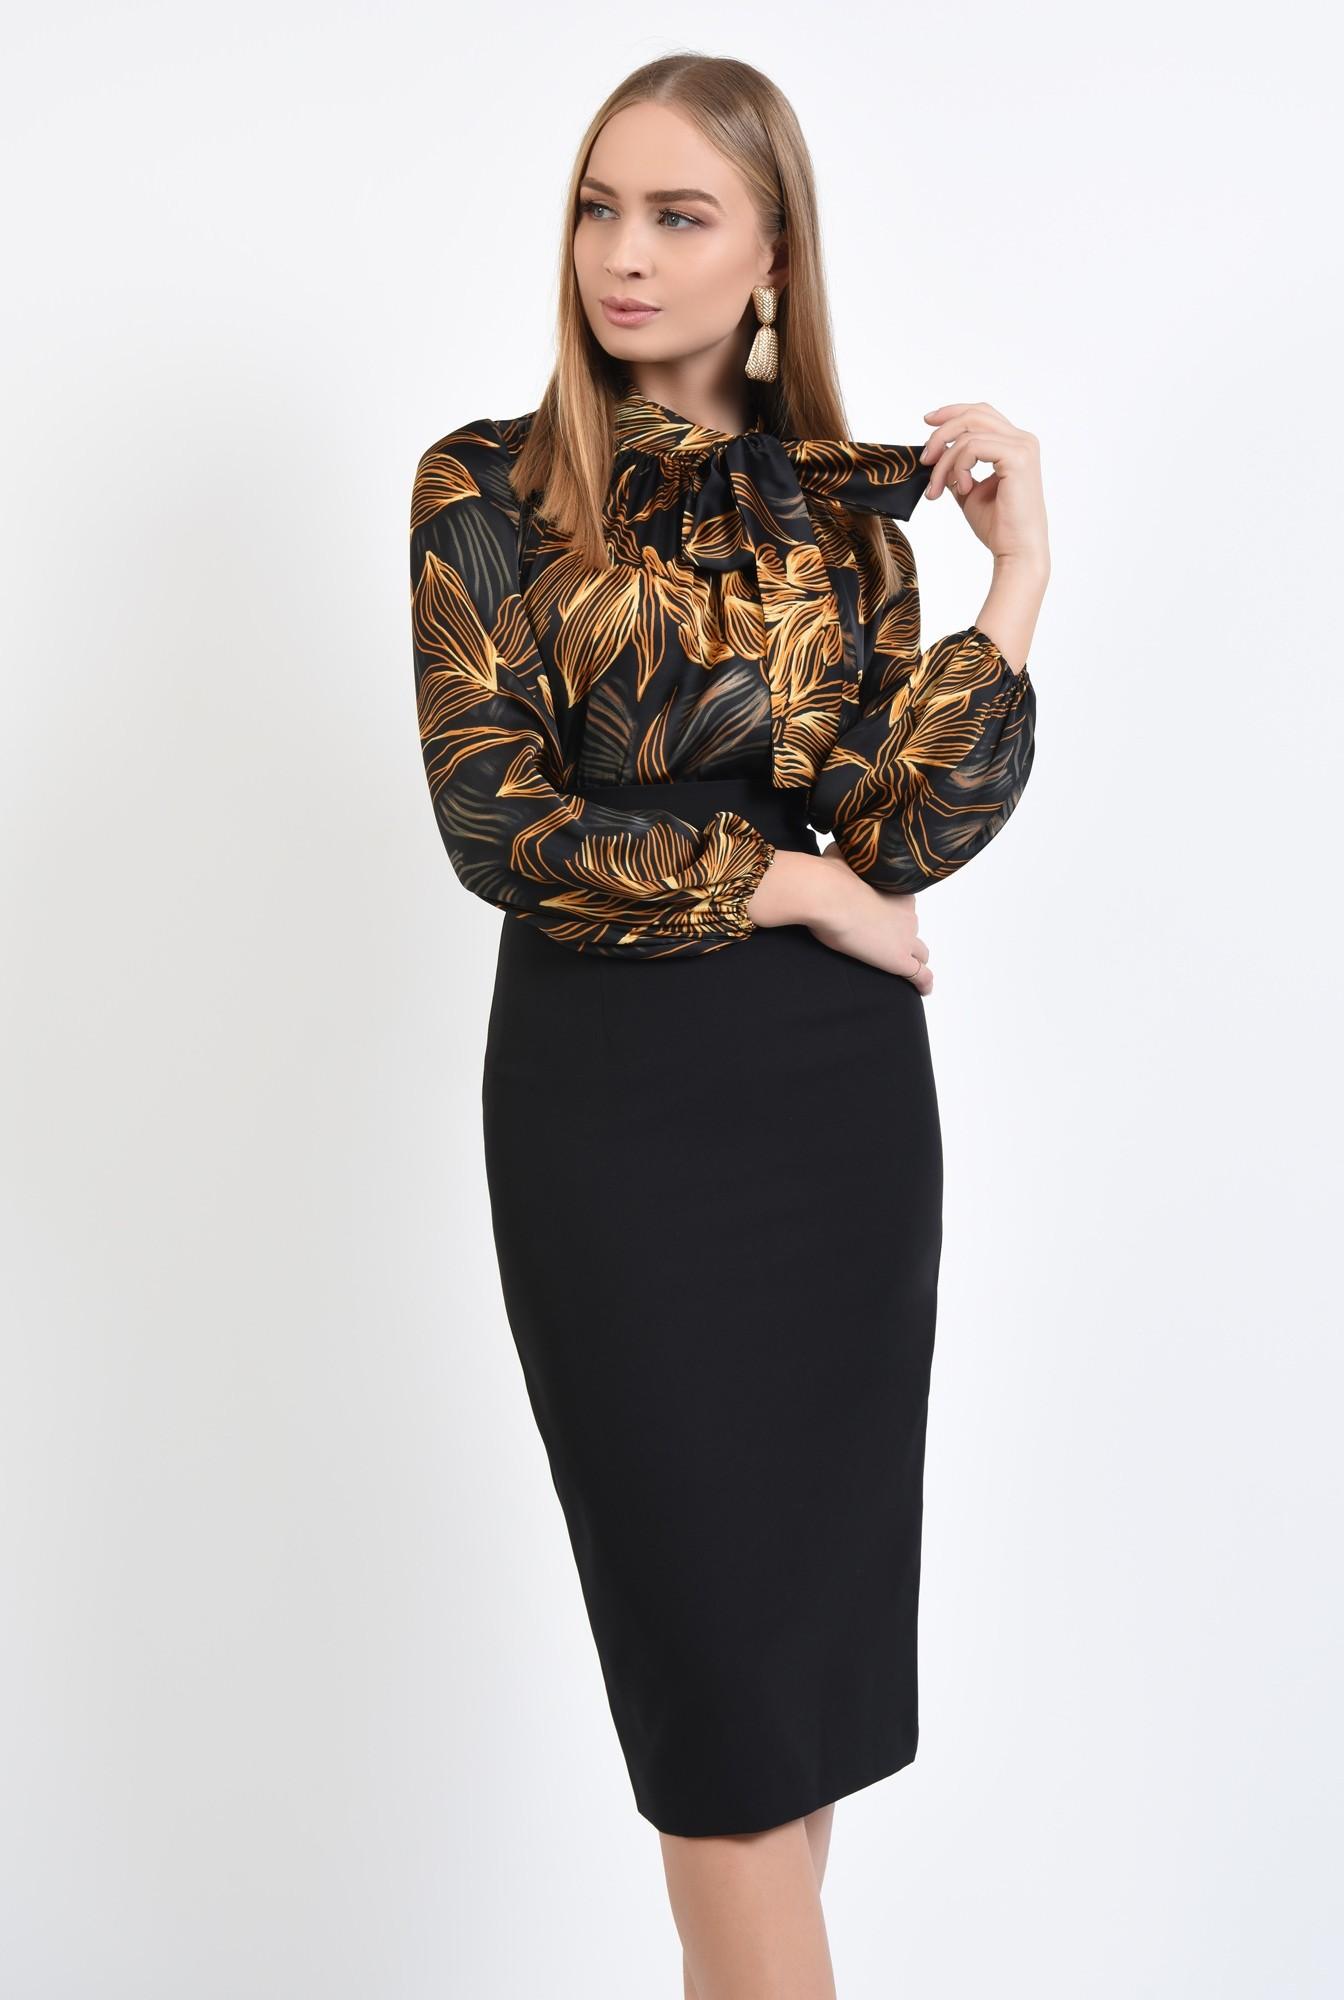 0 - 360 - bluza dama, online, croi lejer, funda tip esarfa